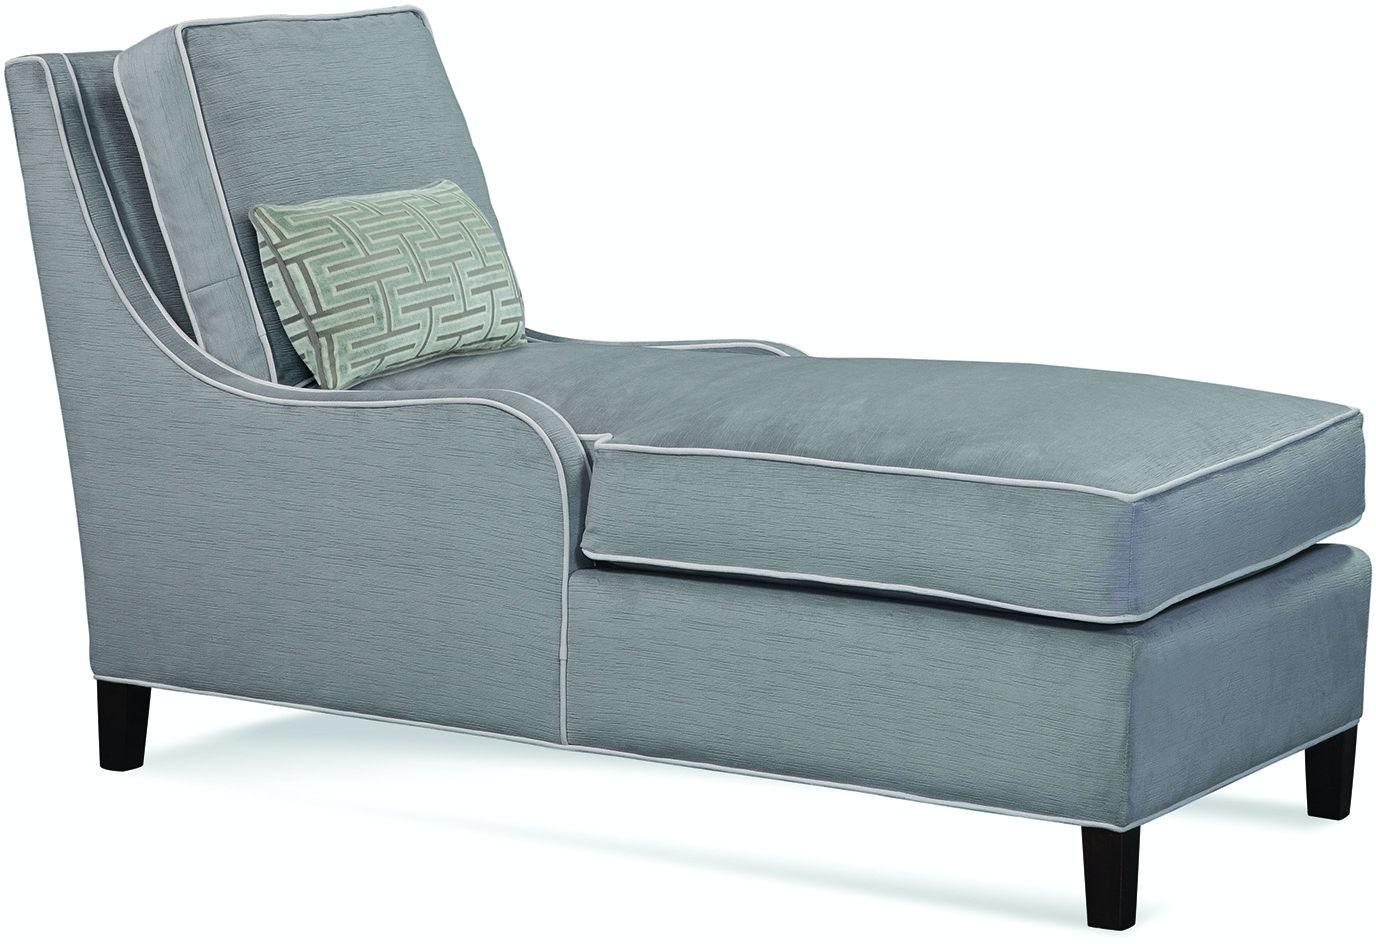 Braxton Culler Living Room Chaise 515 092 Kalin Home